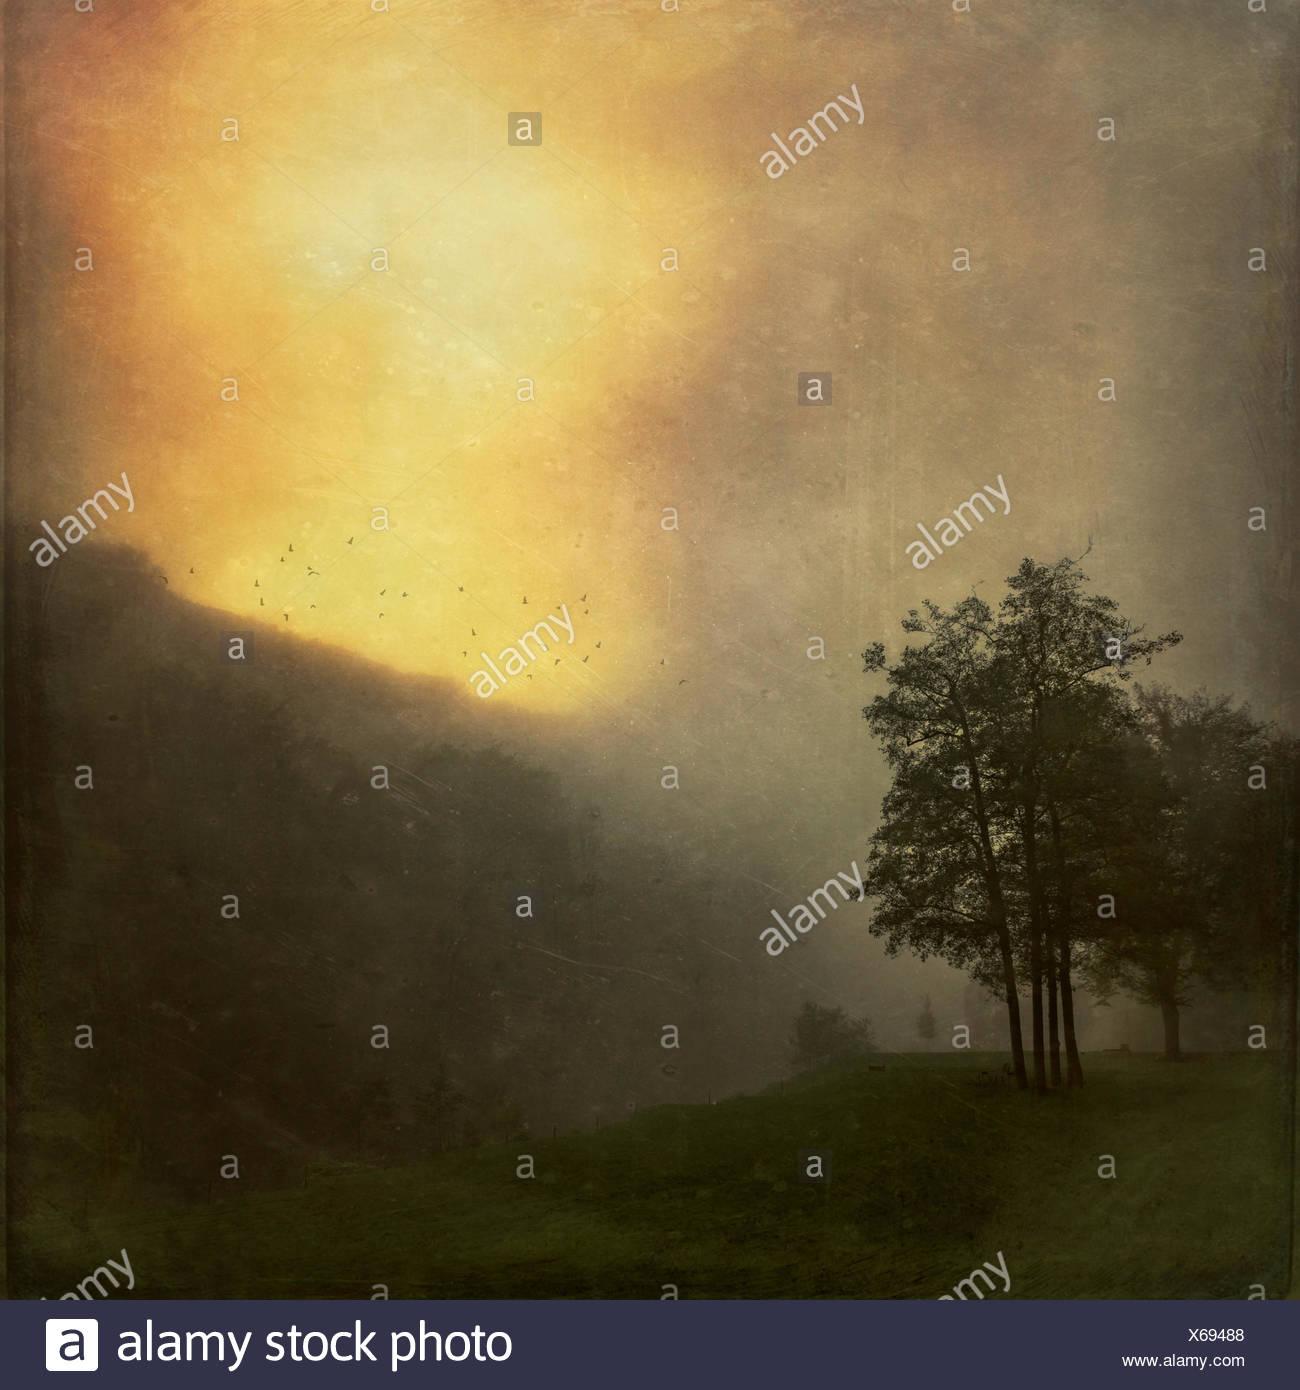 Landschaft bei Sonnenaufgang im Nebel, Struktureffekt Stockbild